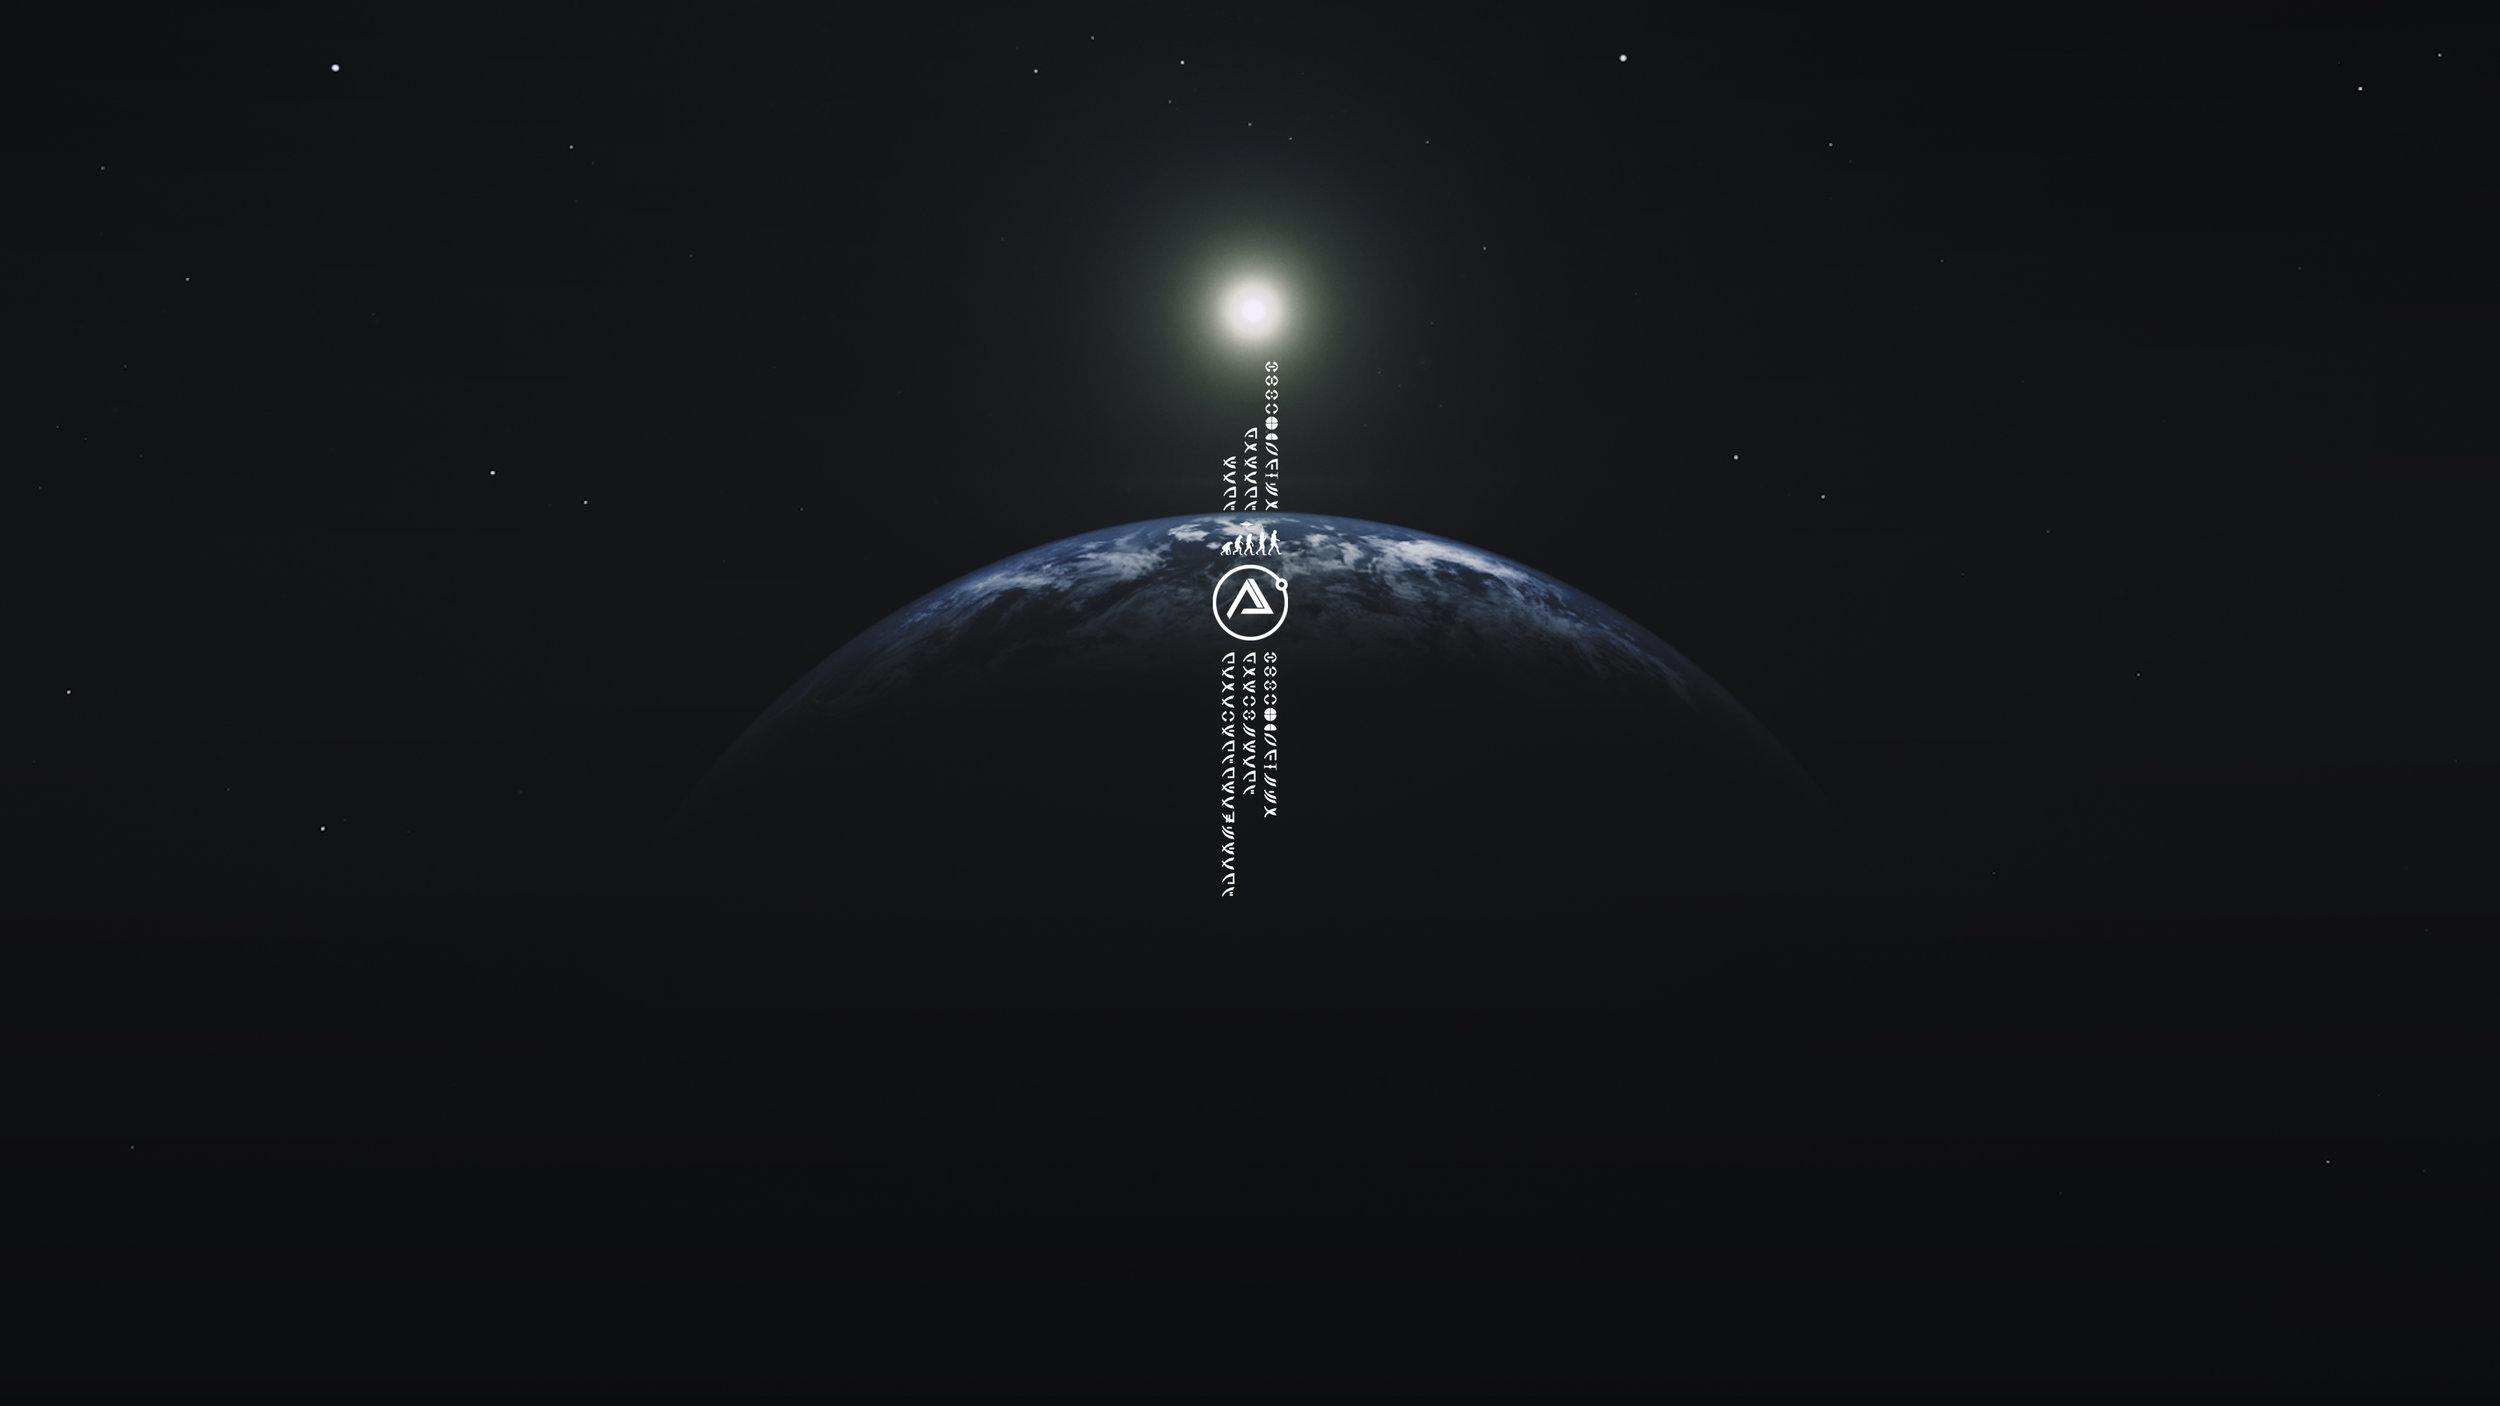 The Illumination Earth Background_edit.jpg